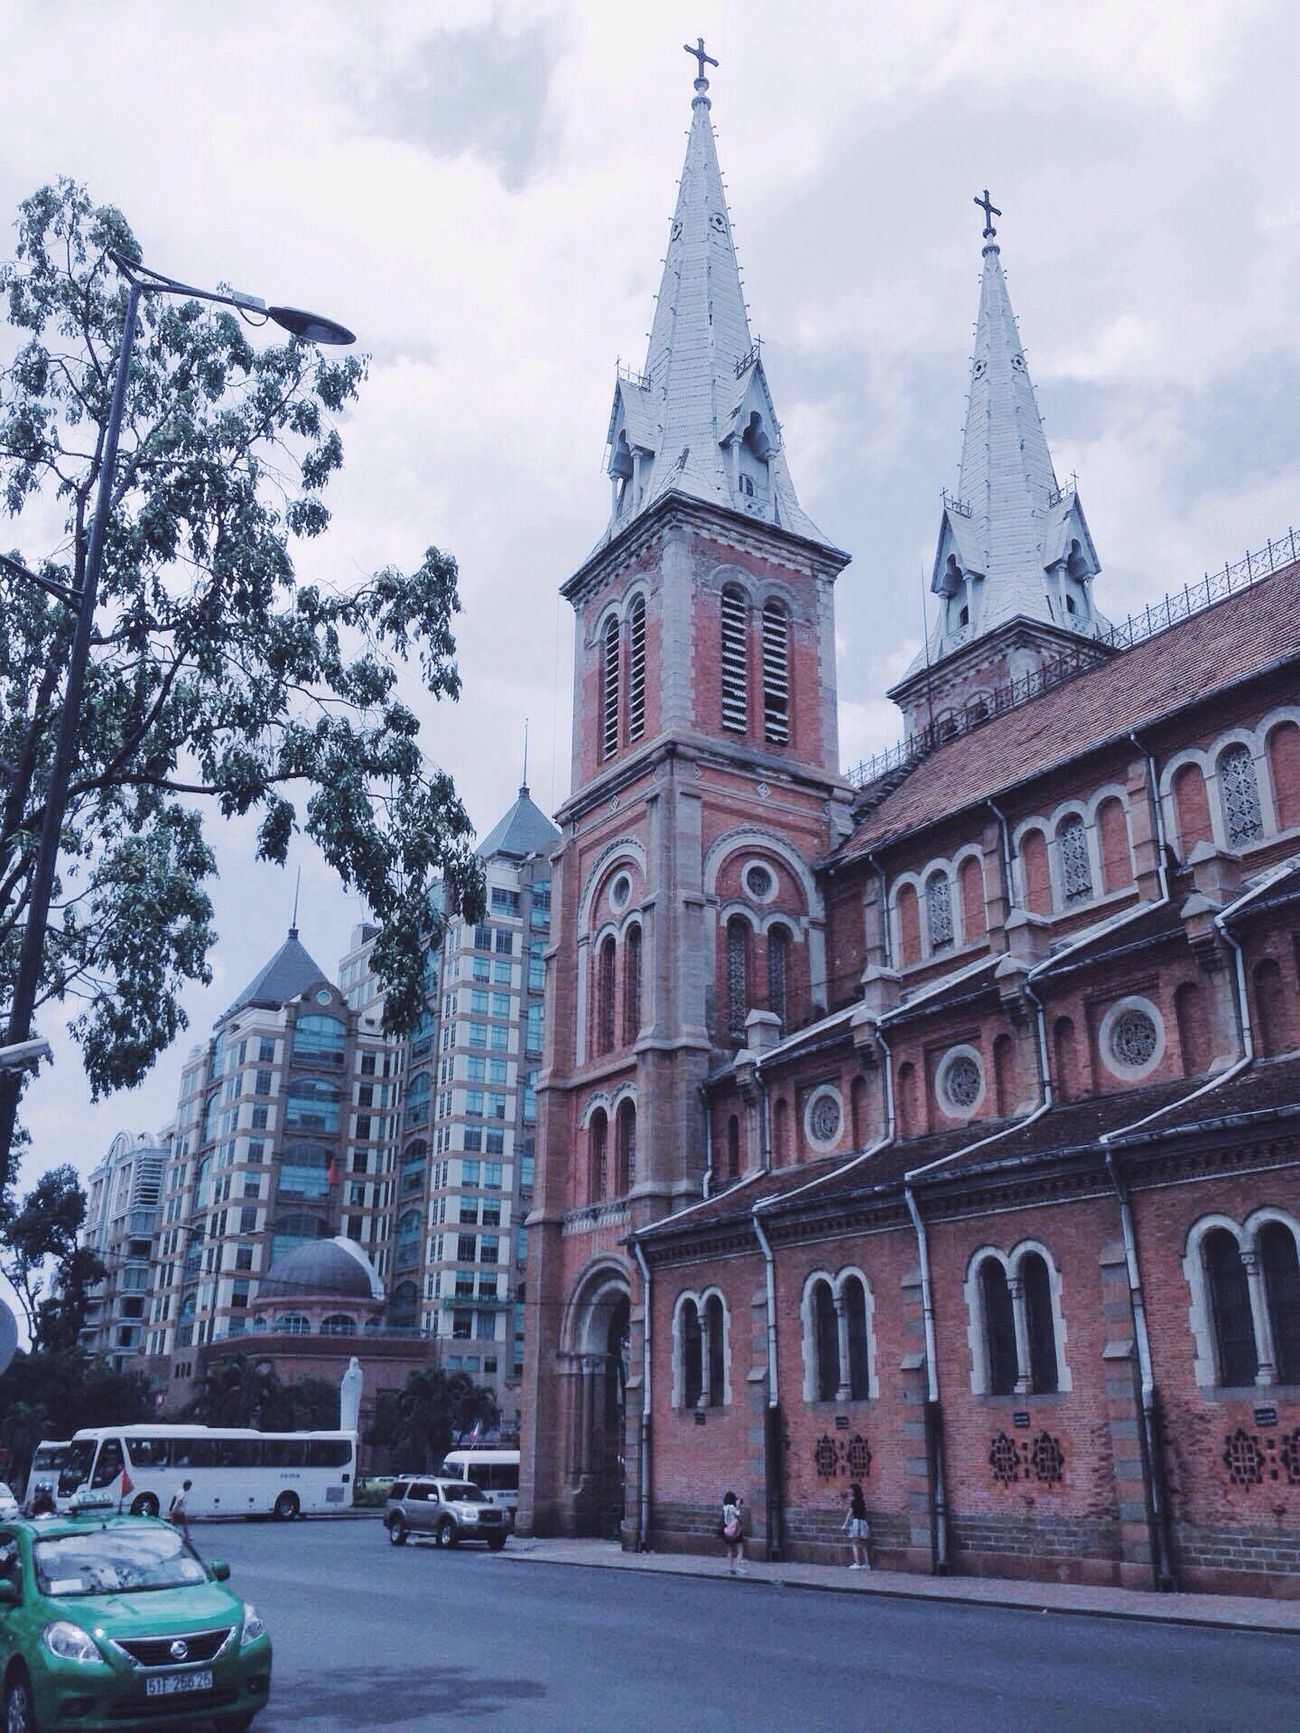 The Architect - 2016 EyeEm Awards The Street Photographer - 2016 EyeEm Awards Vietnam Ho Chi Minh City Immaculate Conception Cathedral Basilica Nhà Thờ Đức Bà